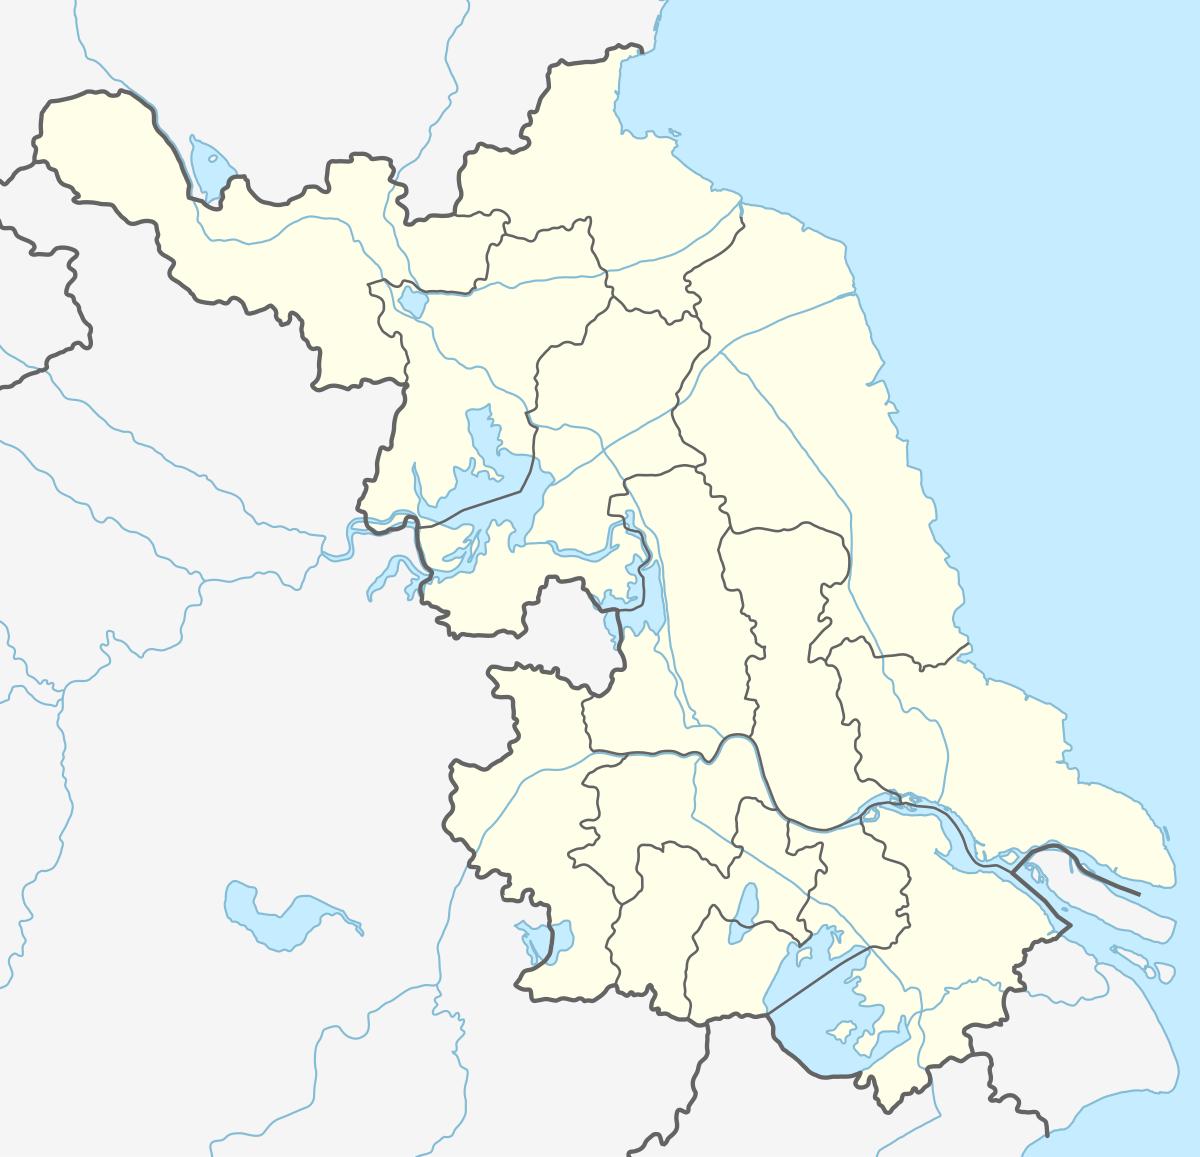 1200px China Jiangsu adm location mapg